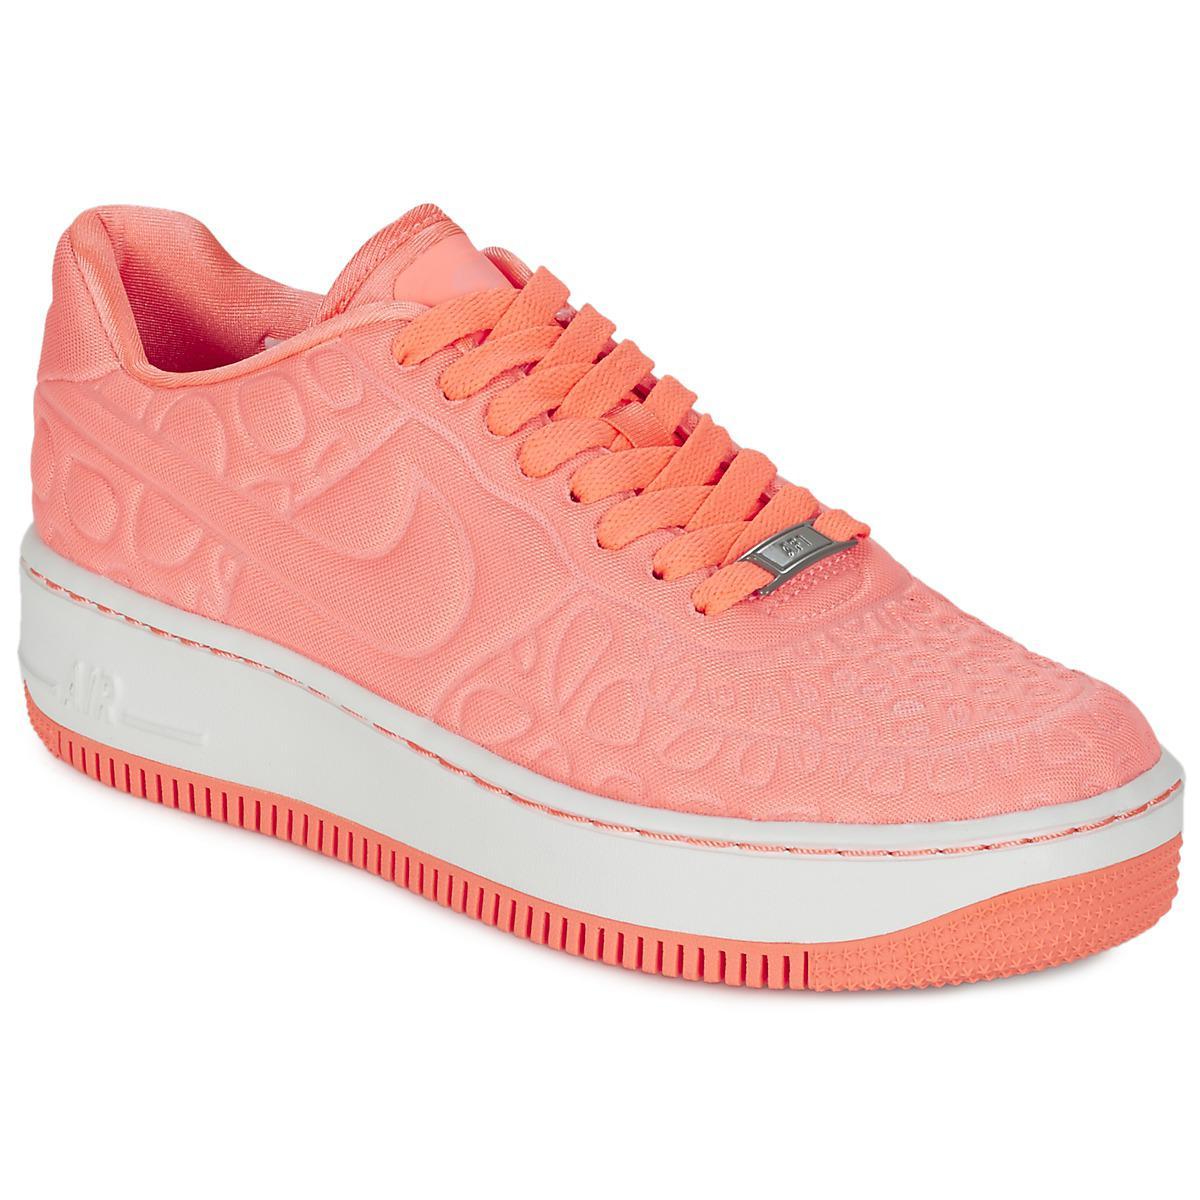 Upstep Plush W Air 1 Rose Force Nike En Coloris Chaussures Femmes derCoWEQBx